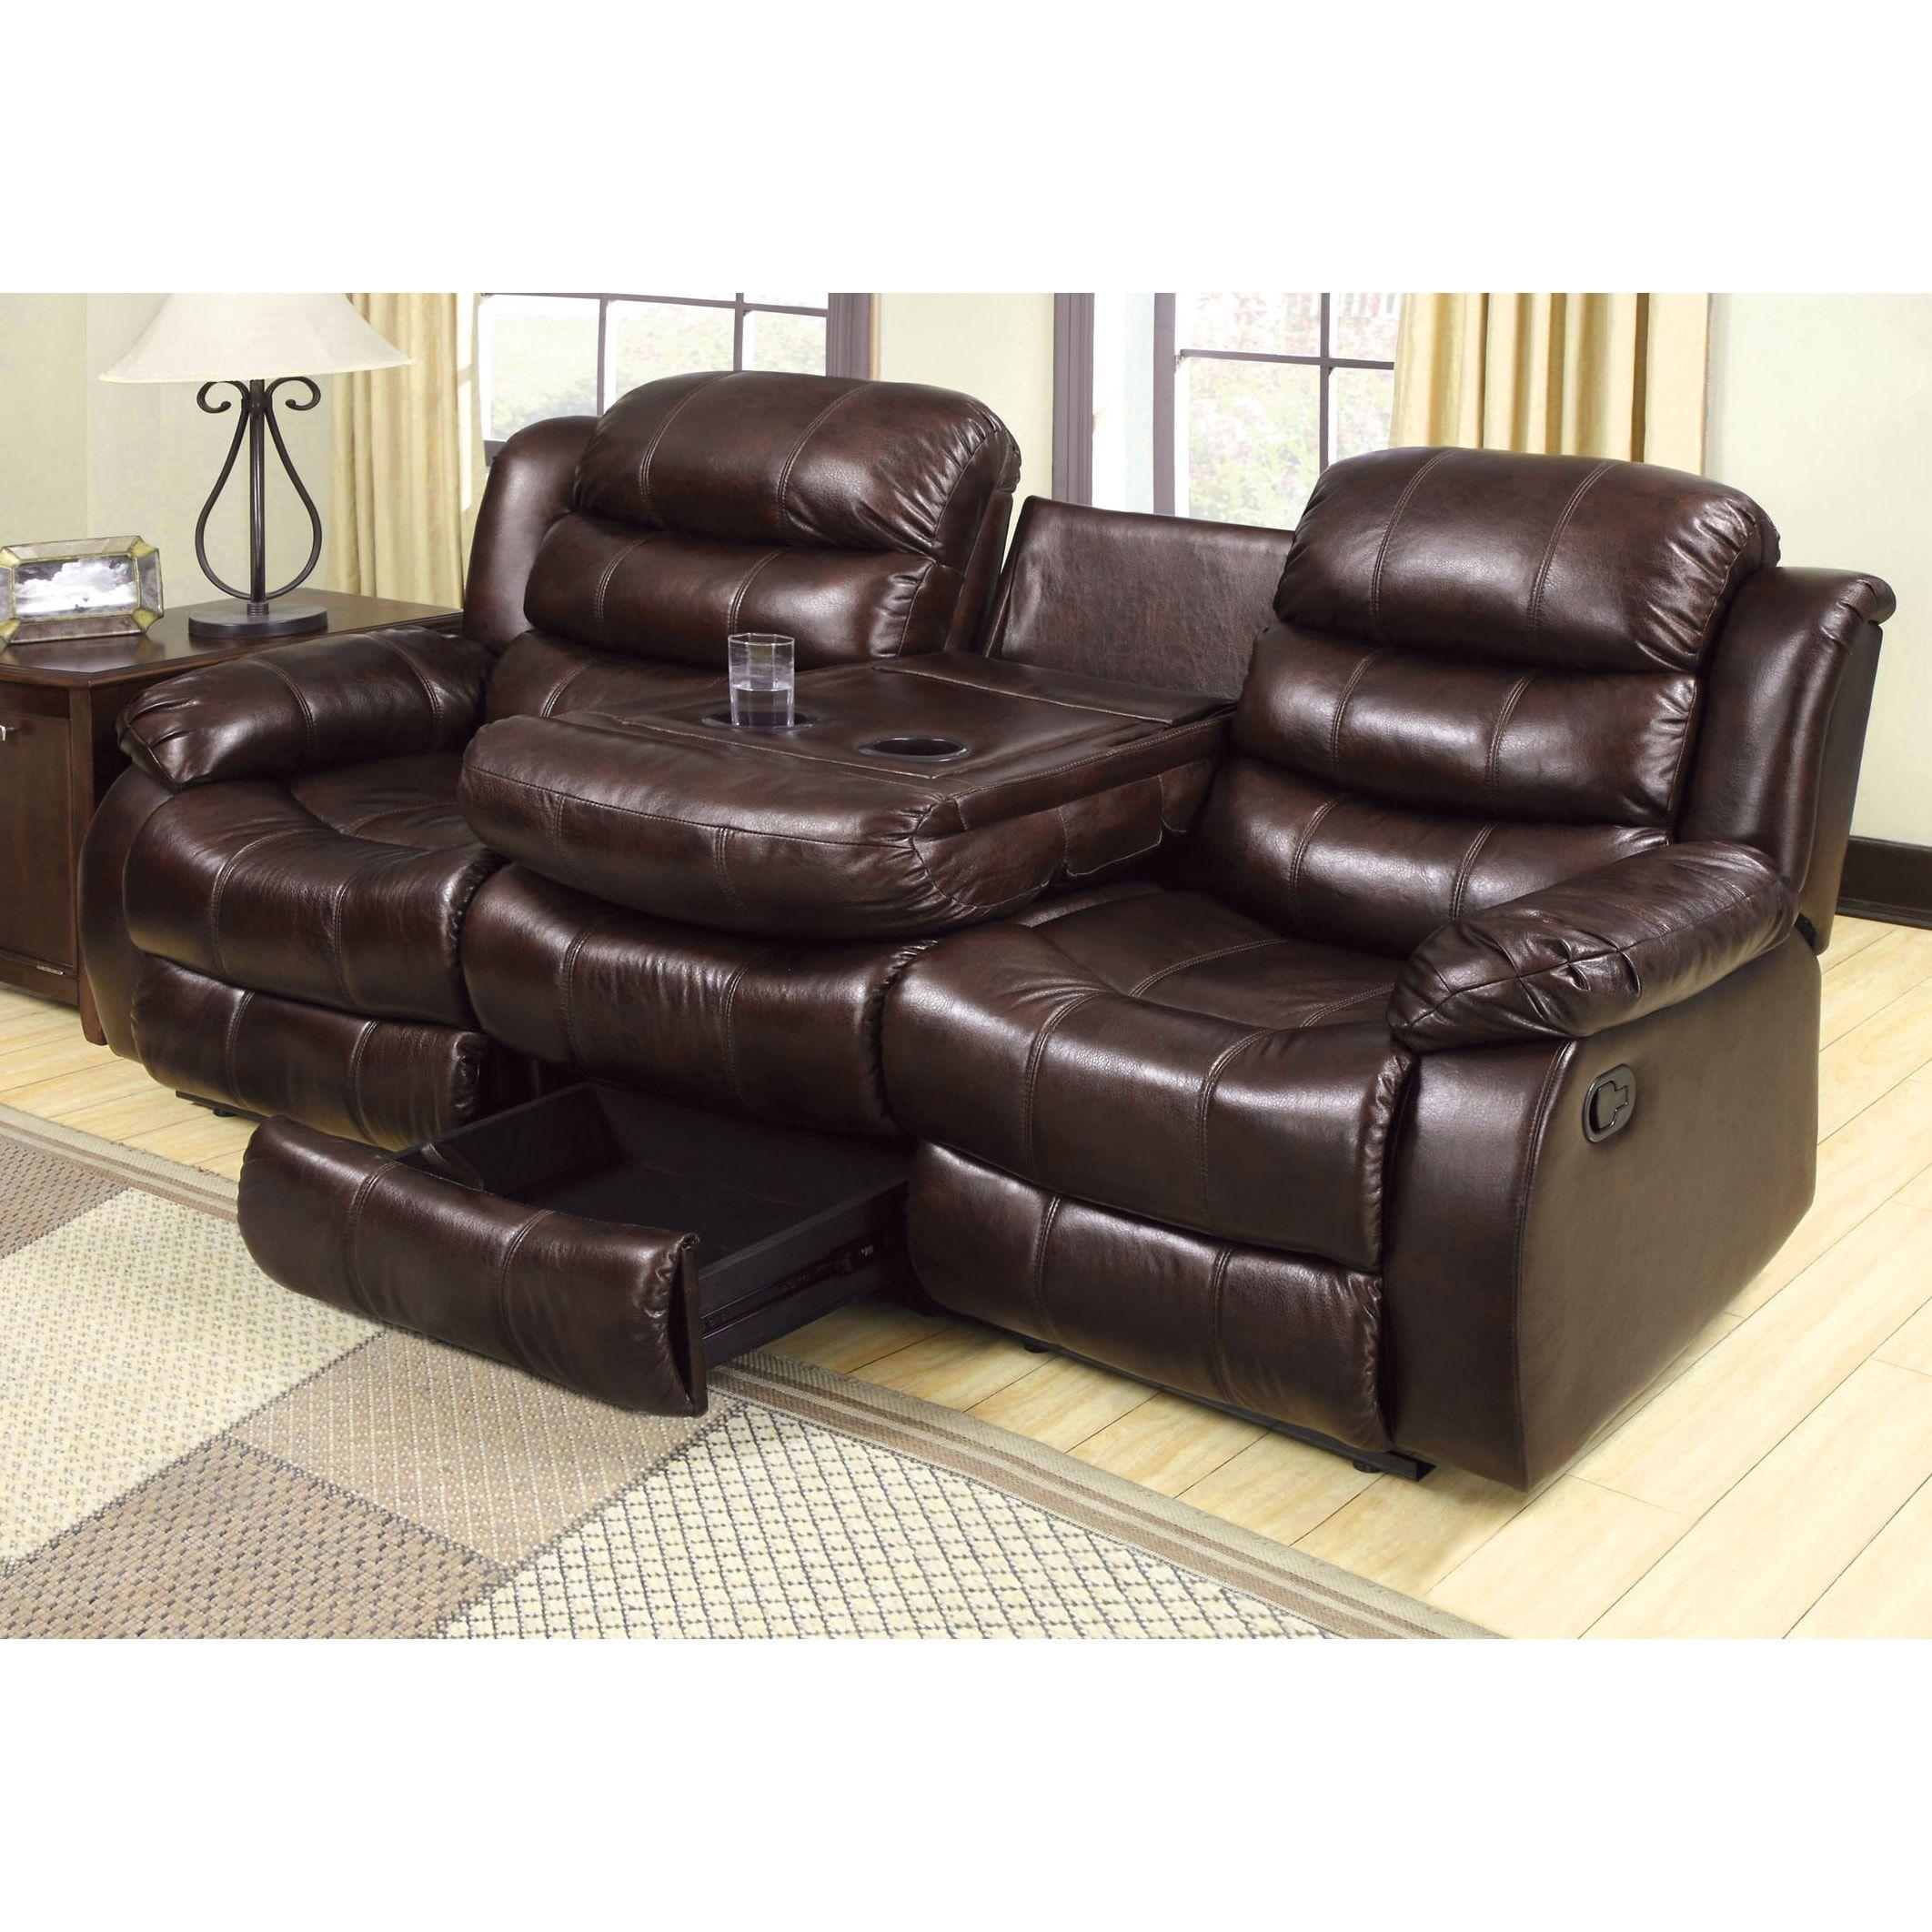 Furniture of America Berkshield Transitional Dark Brown Leather-like ...